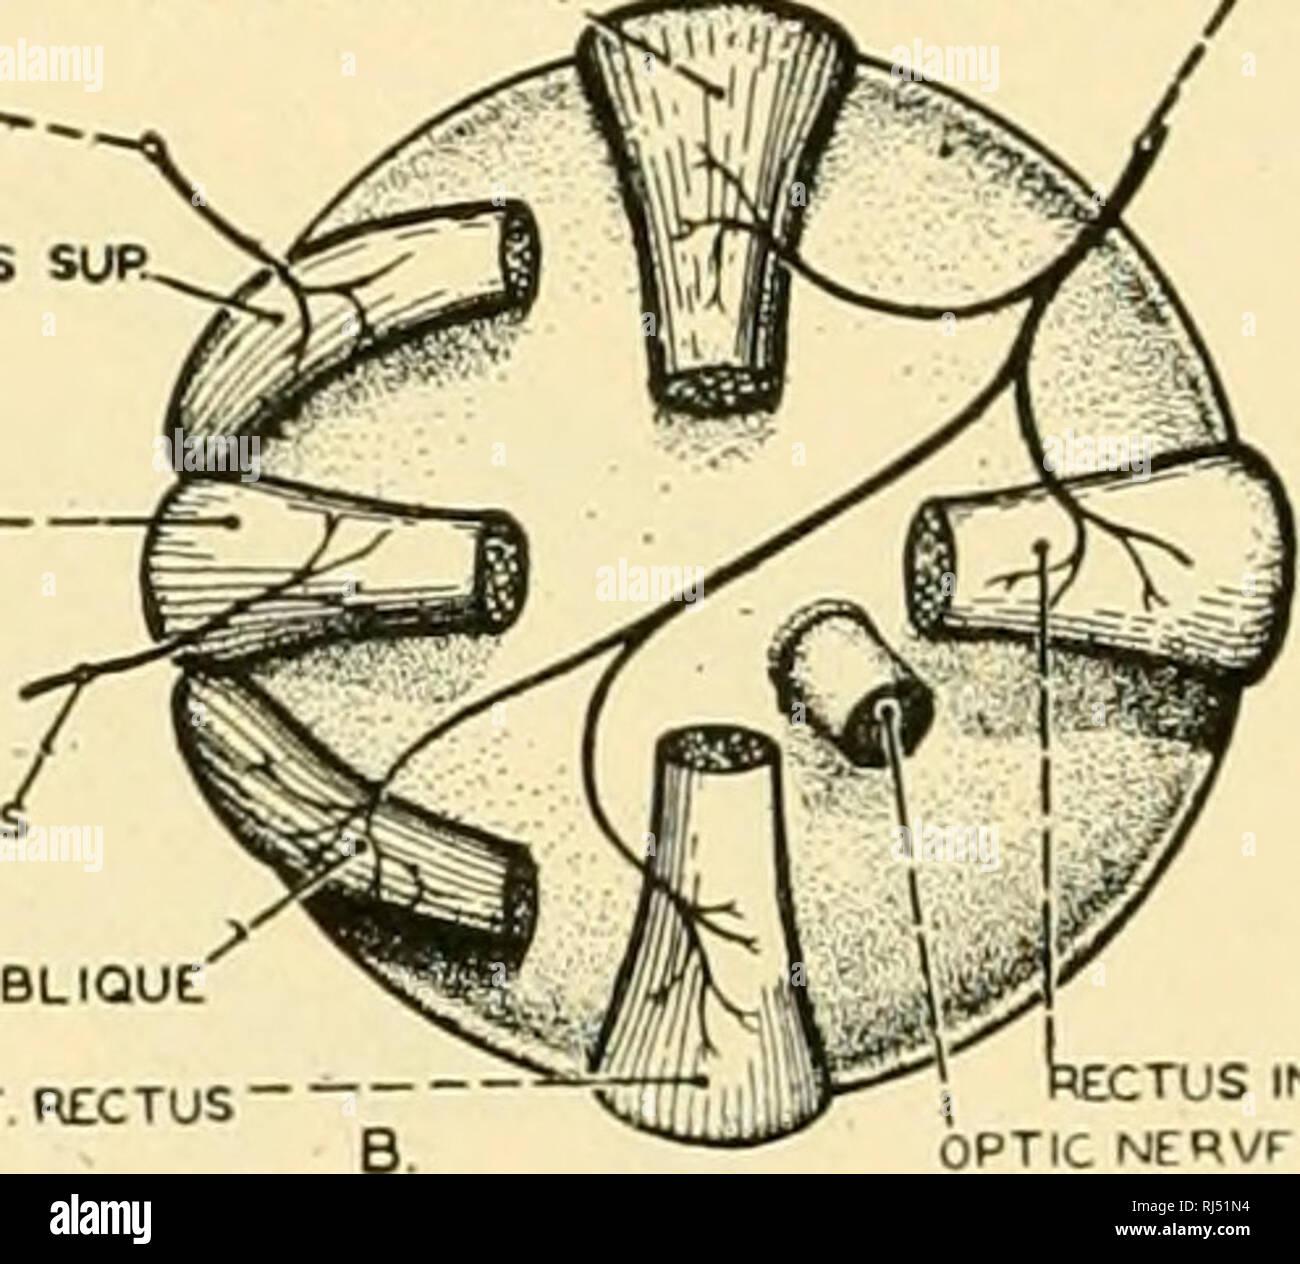 diagram of the left eye honda xrm cdi wiring diagrams stock photos images chordate anatomy chordata comparative cxr rectus nf